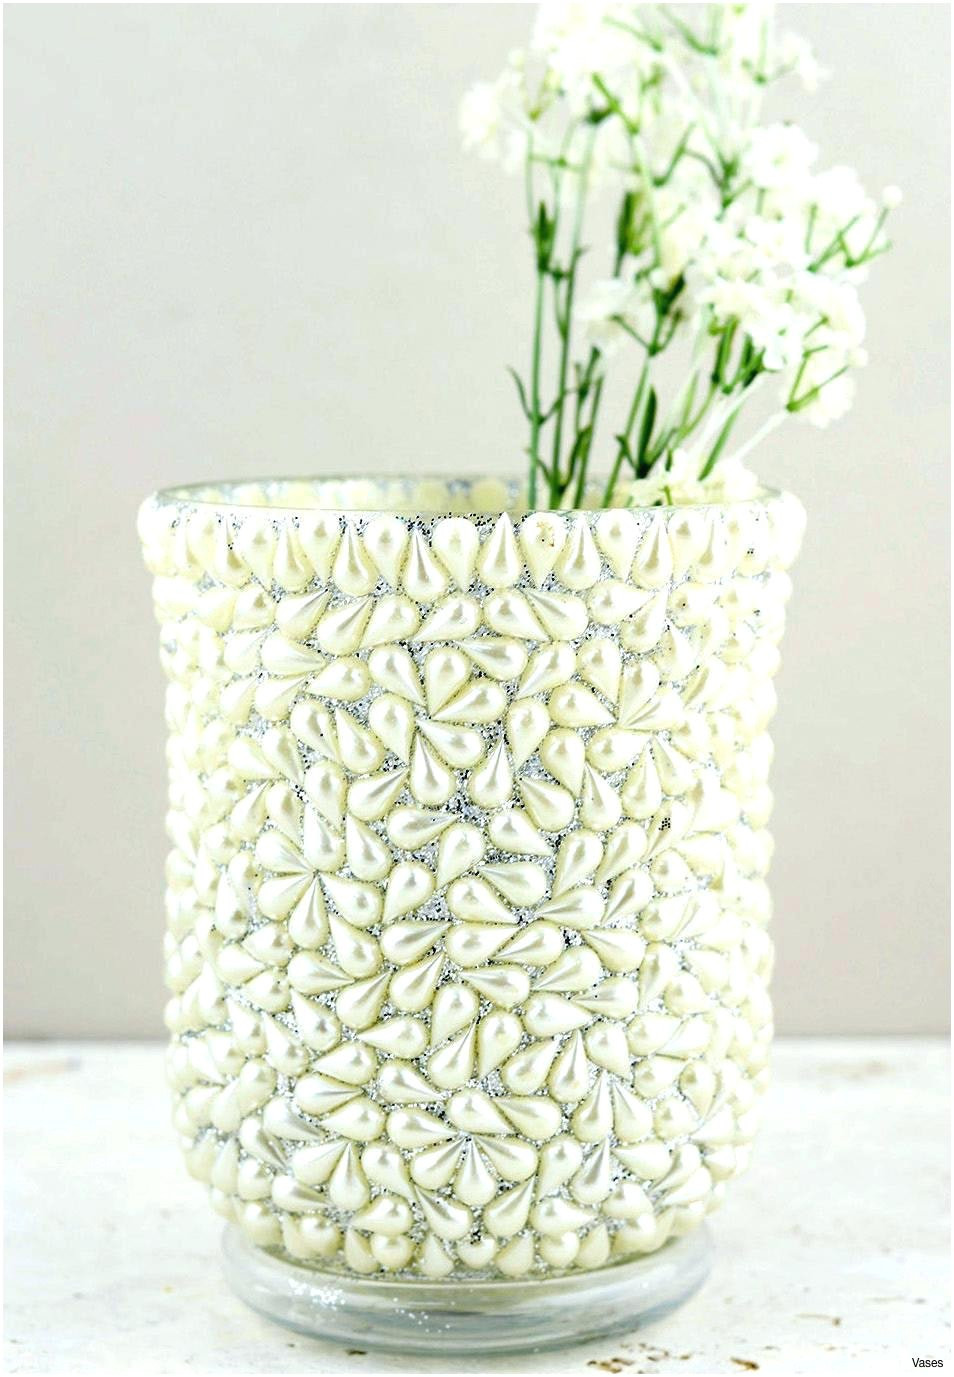 white vase filler of vase filler for fake flowers flowers healthy within bulk artificial flowers fantastic gl vase fillers ideas cylinder vases walmart mercury bulkh bulk 954 pixels